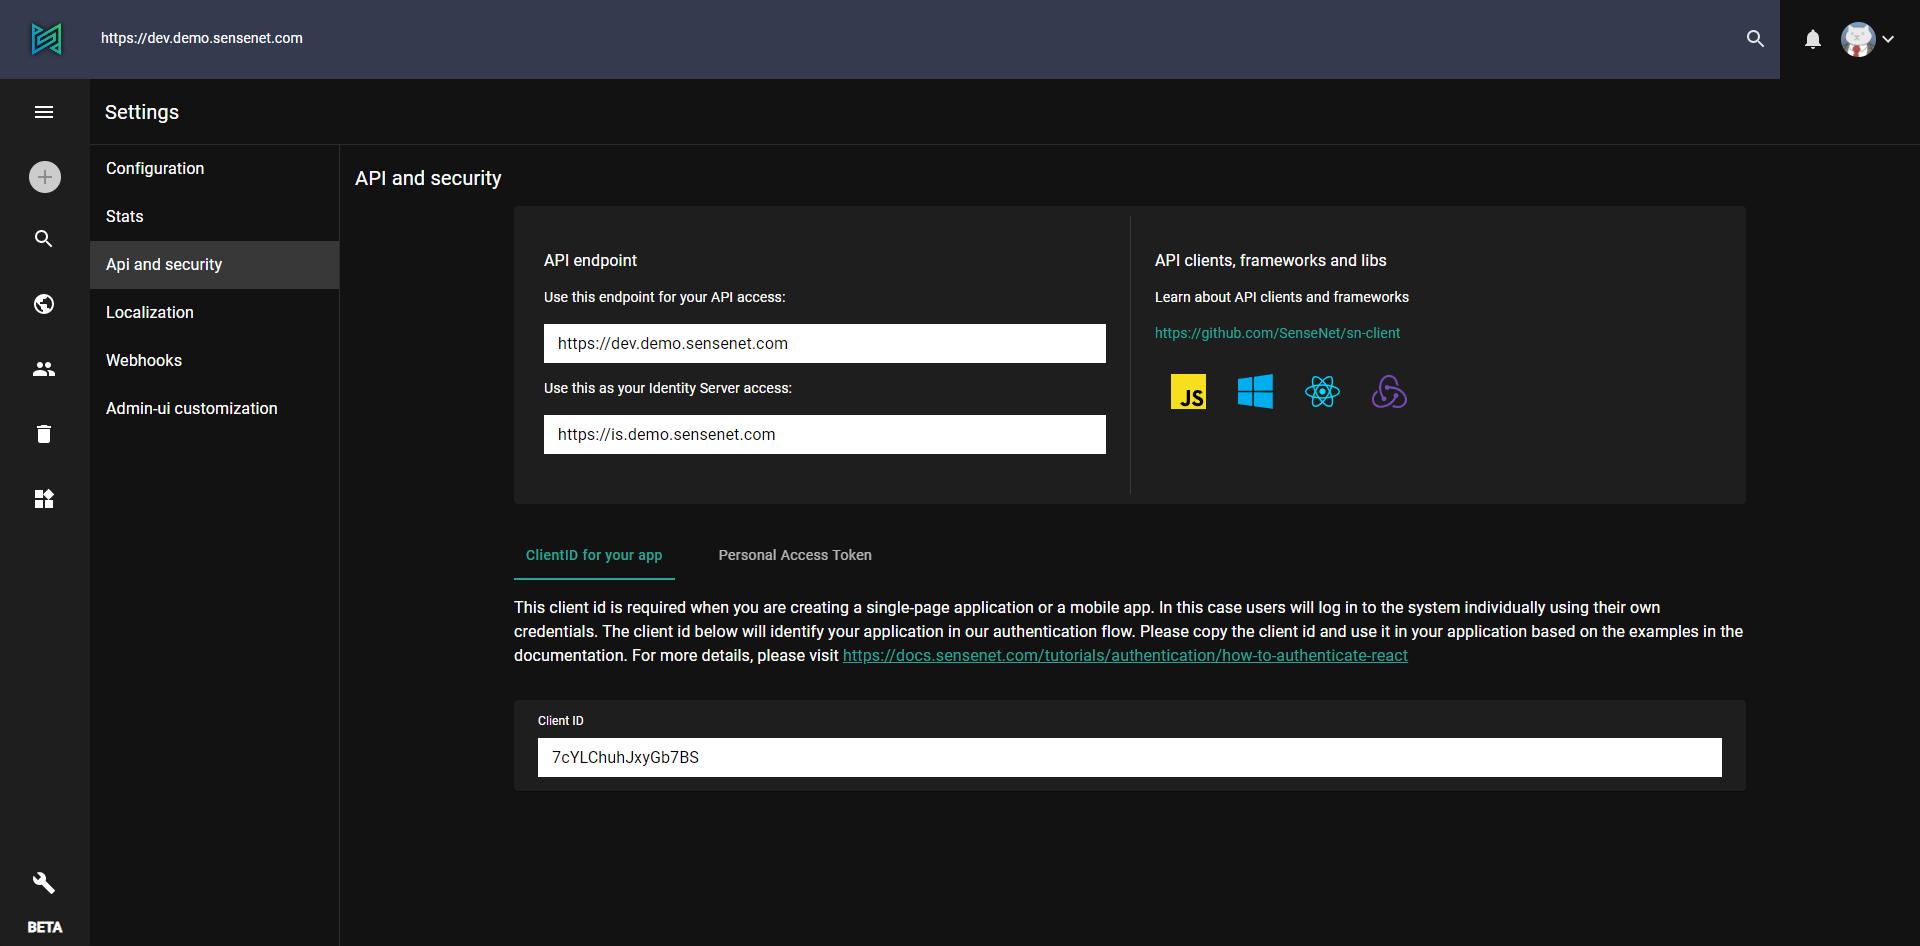 API and Security - Settings